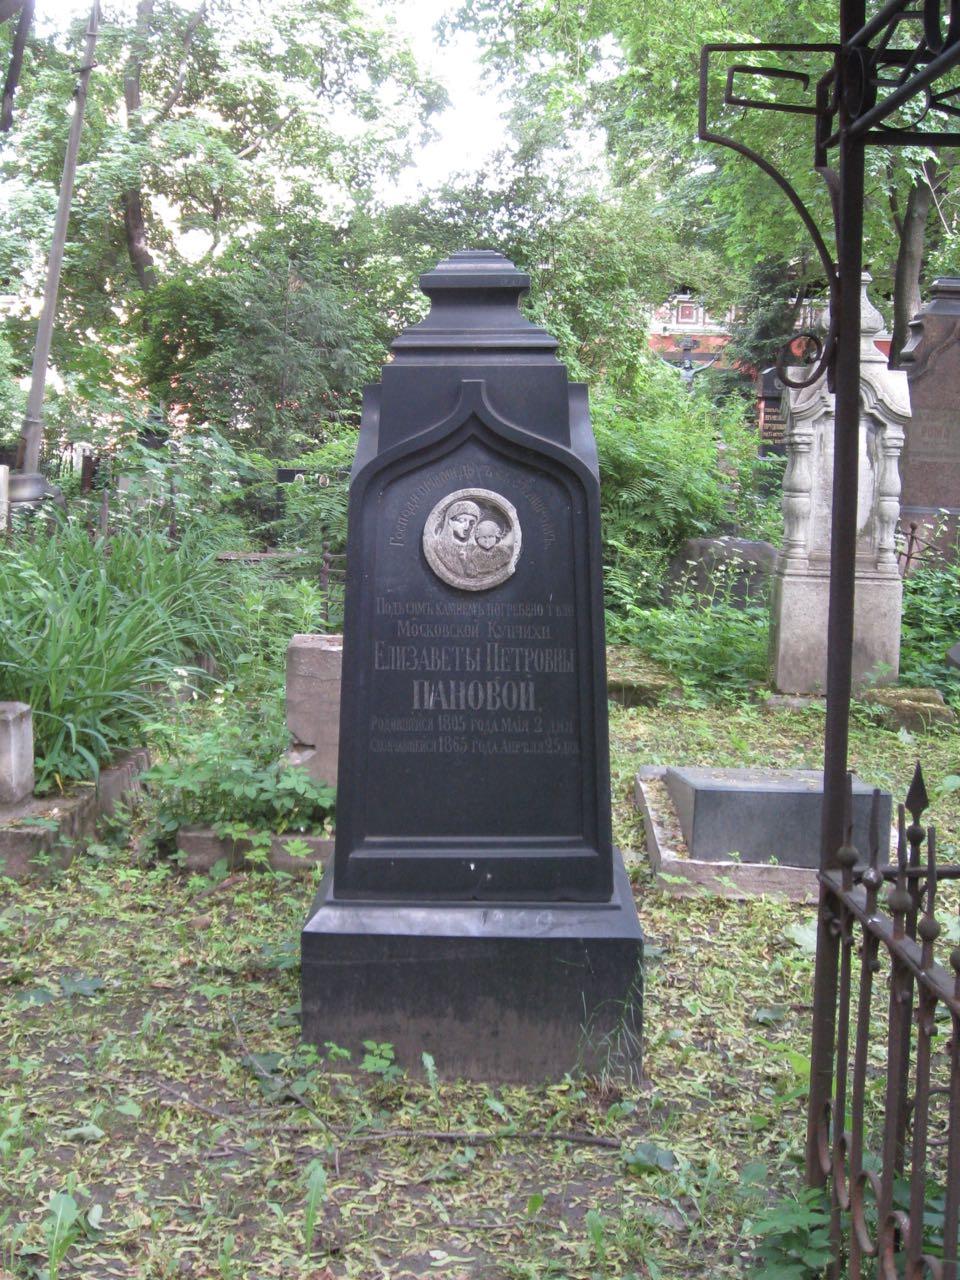 Gravestone of the merchant woman Elizaveta Petrovna Panova (1805-1865), Donskoi monastery cemetery, Moscow, June 2009